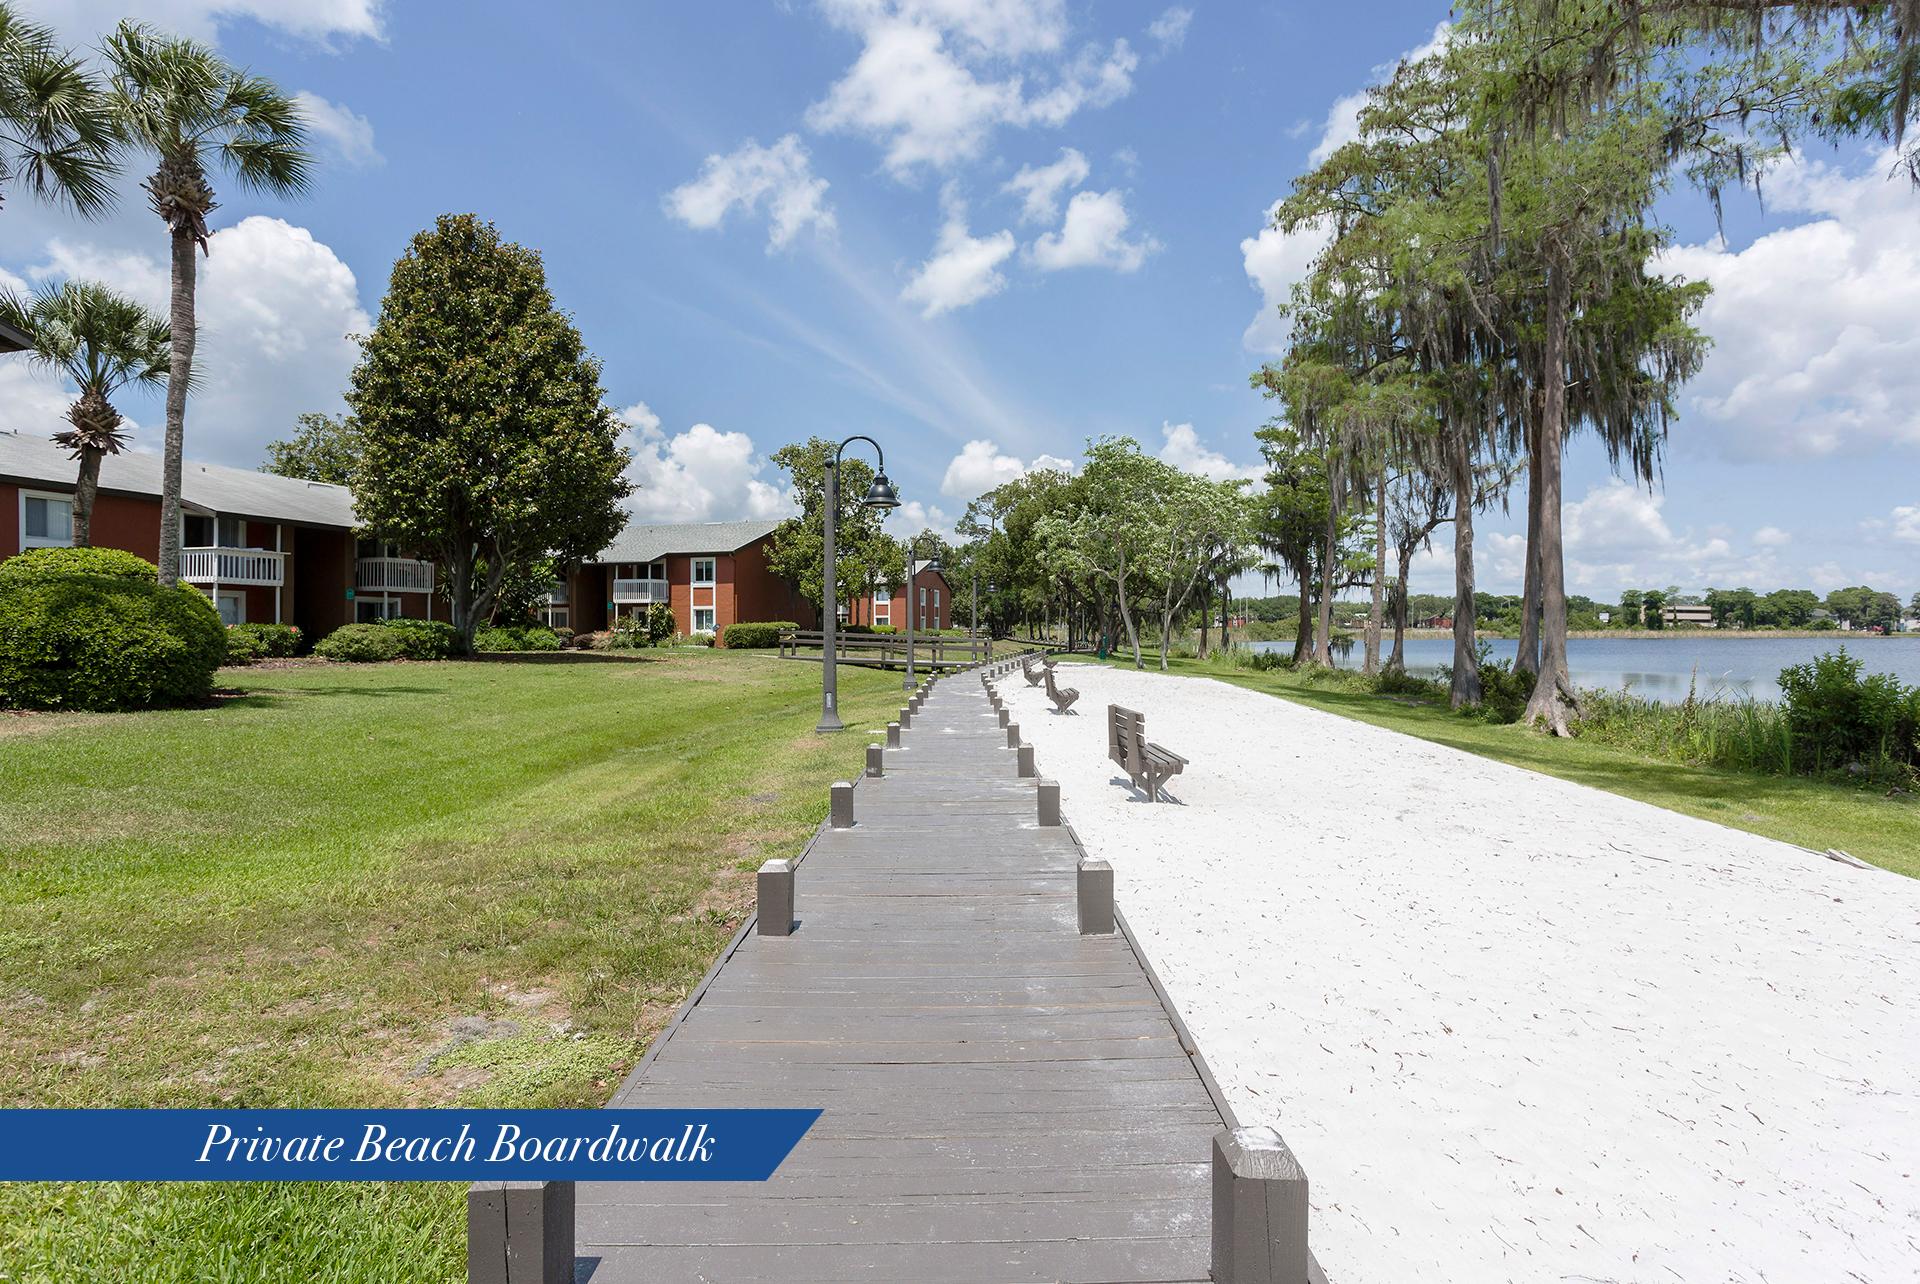 Community-hb-boardwalk